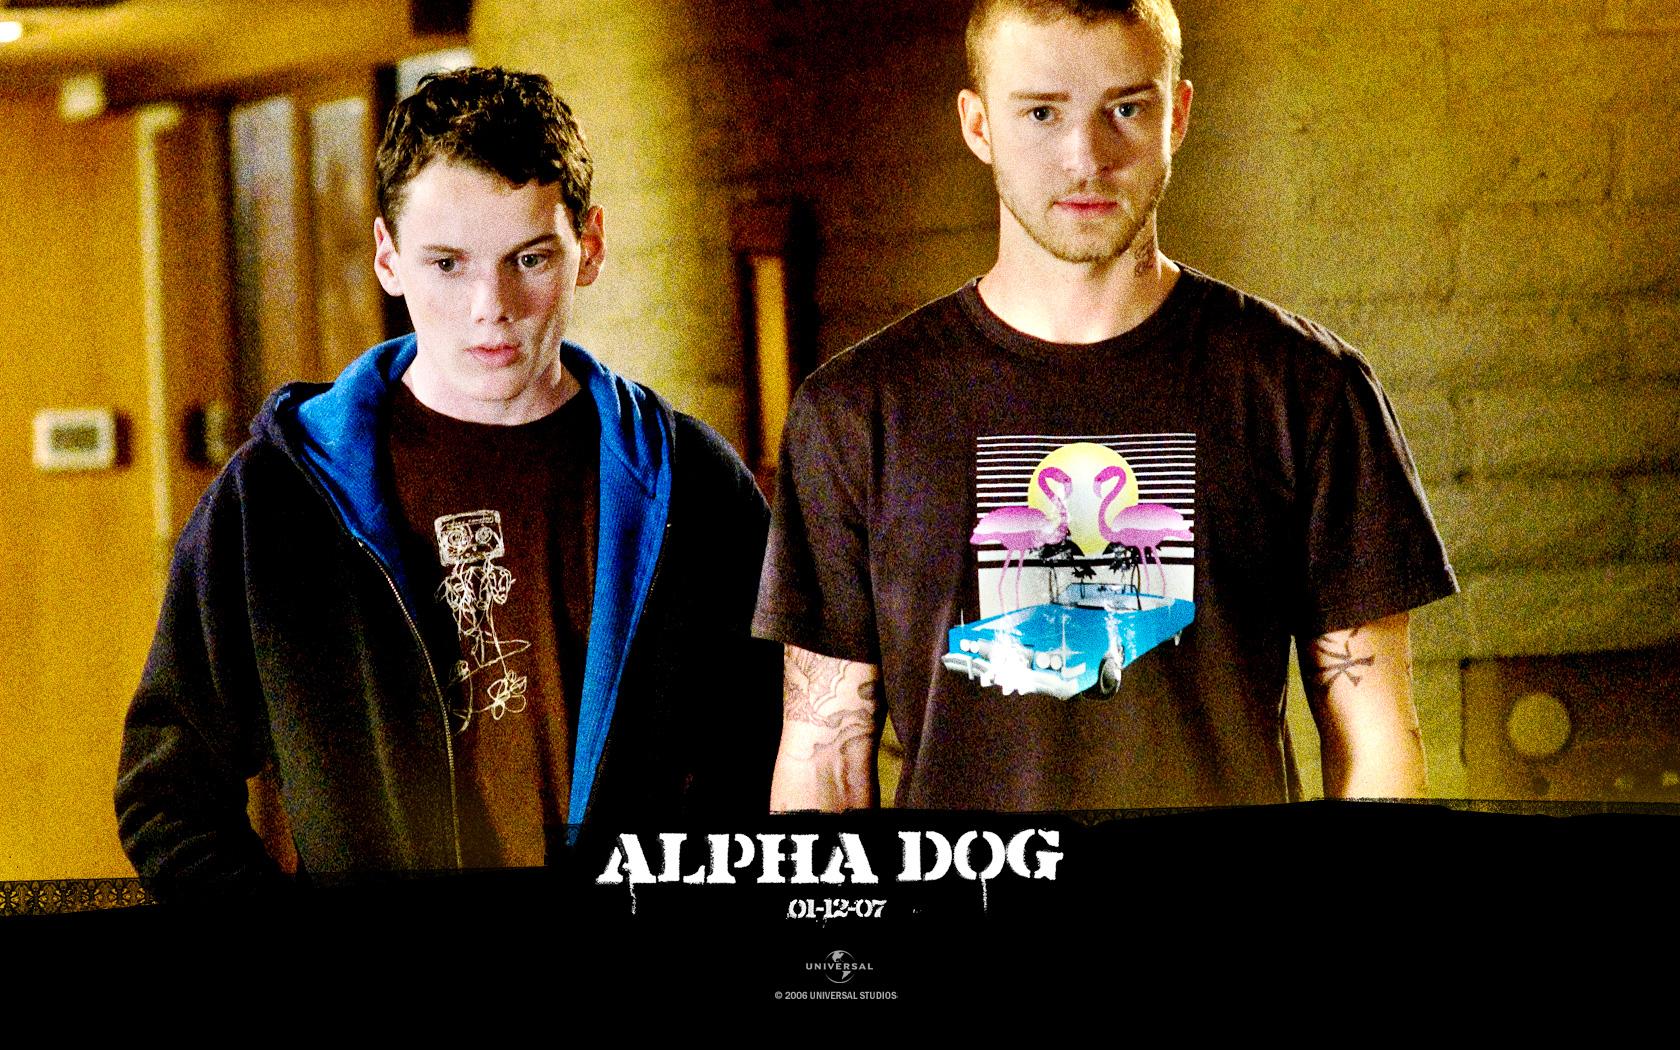 alpha dog Alpha dog official trailer #1 - bruce willis, justin timberlake movie (2006) hd.